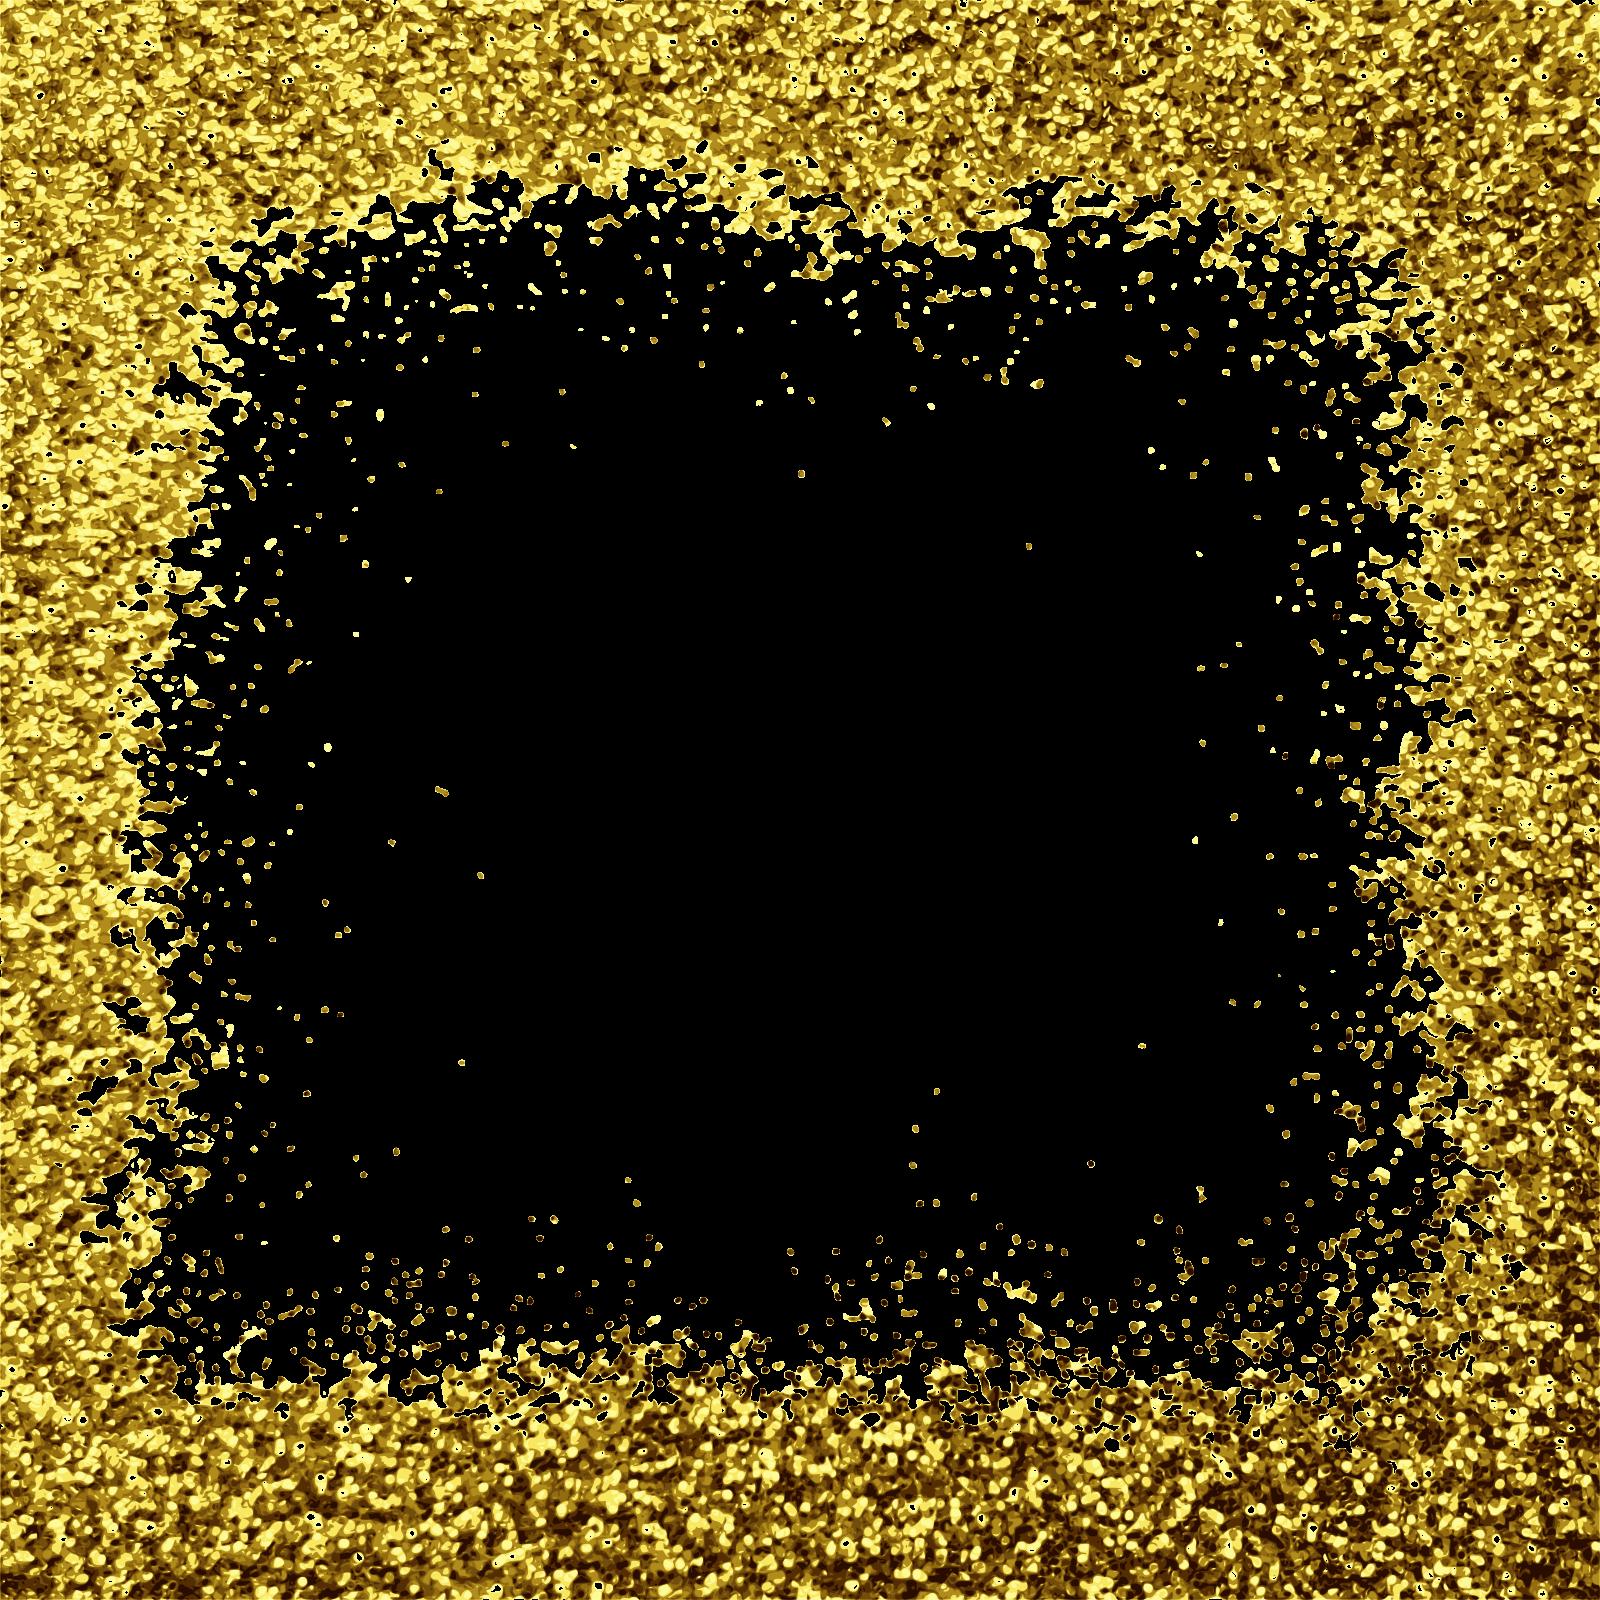 gold-glitter-frame-1.png